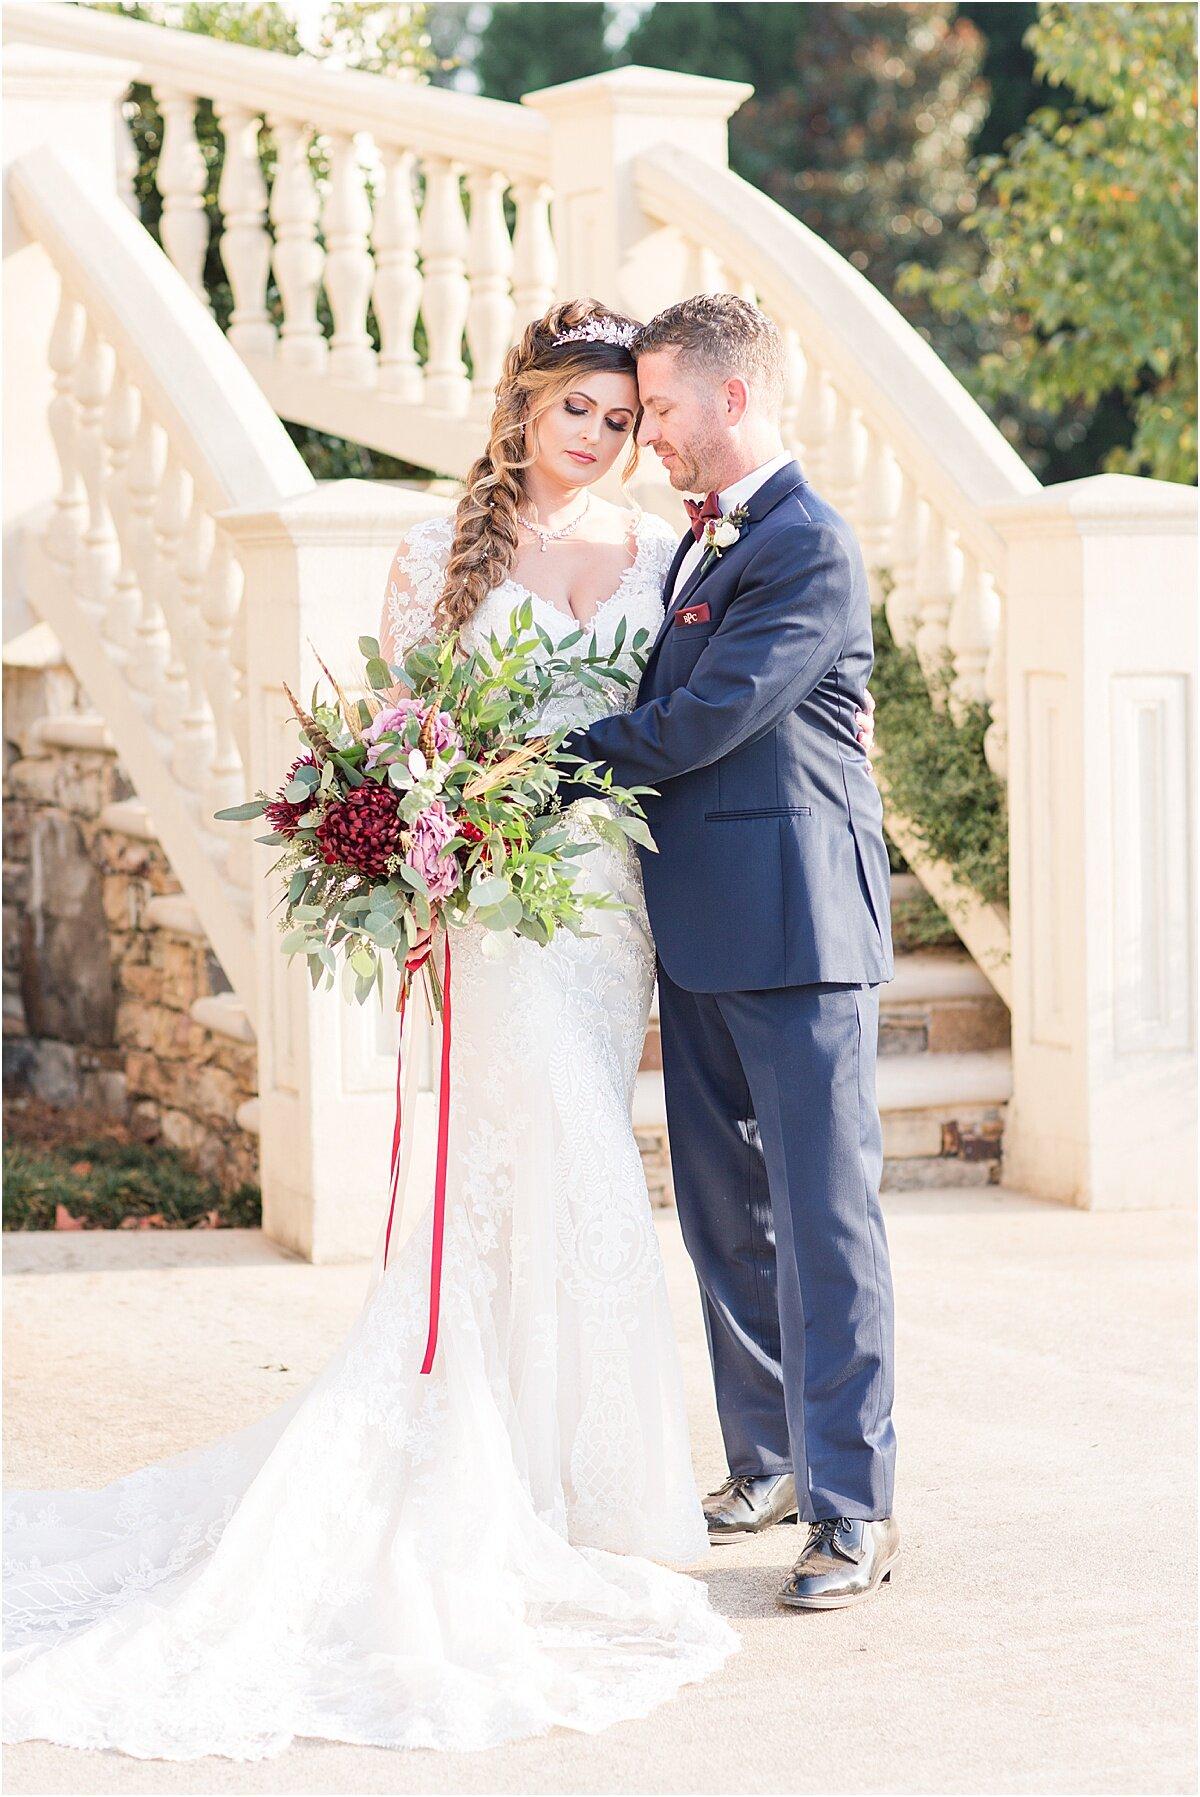 Jersey_Ga_Wedding_Venues_Holly_L_Robbins_Photography_0086.jpg